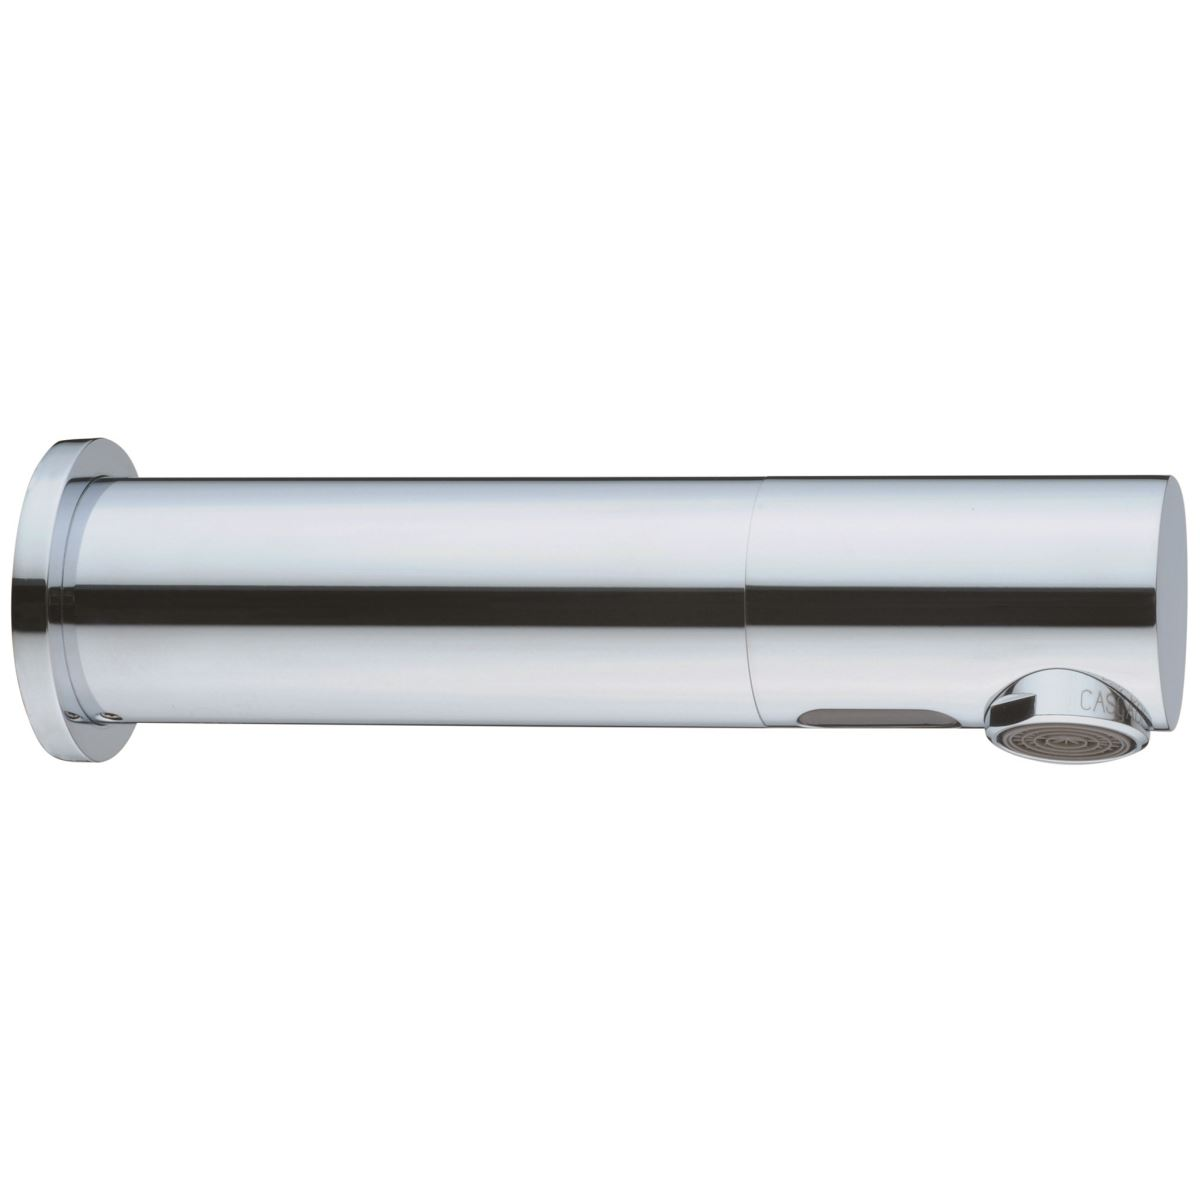 Aquatech Built-in Photocell Basin Mixer (Mains – Single Water Inlet)